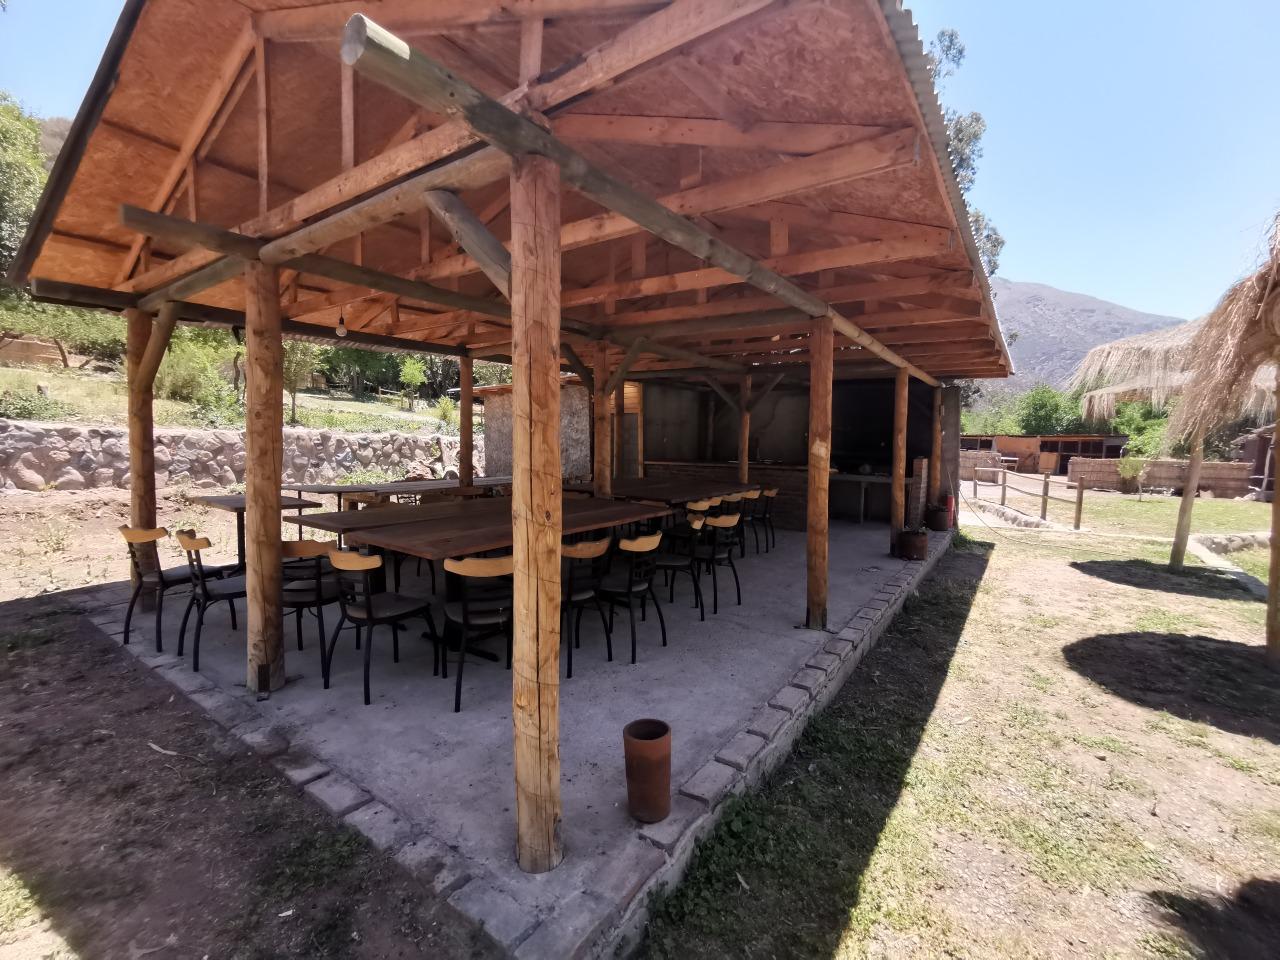 mejores campings cajon del maipo